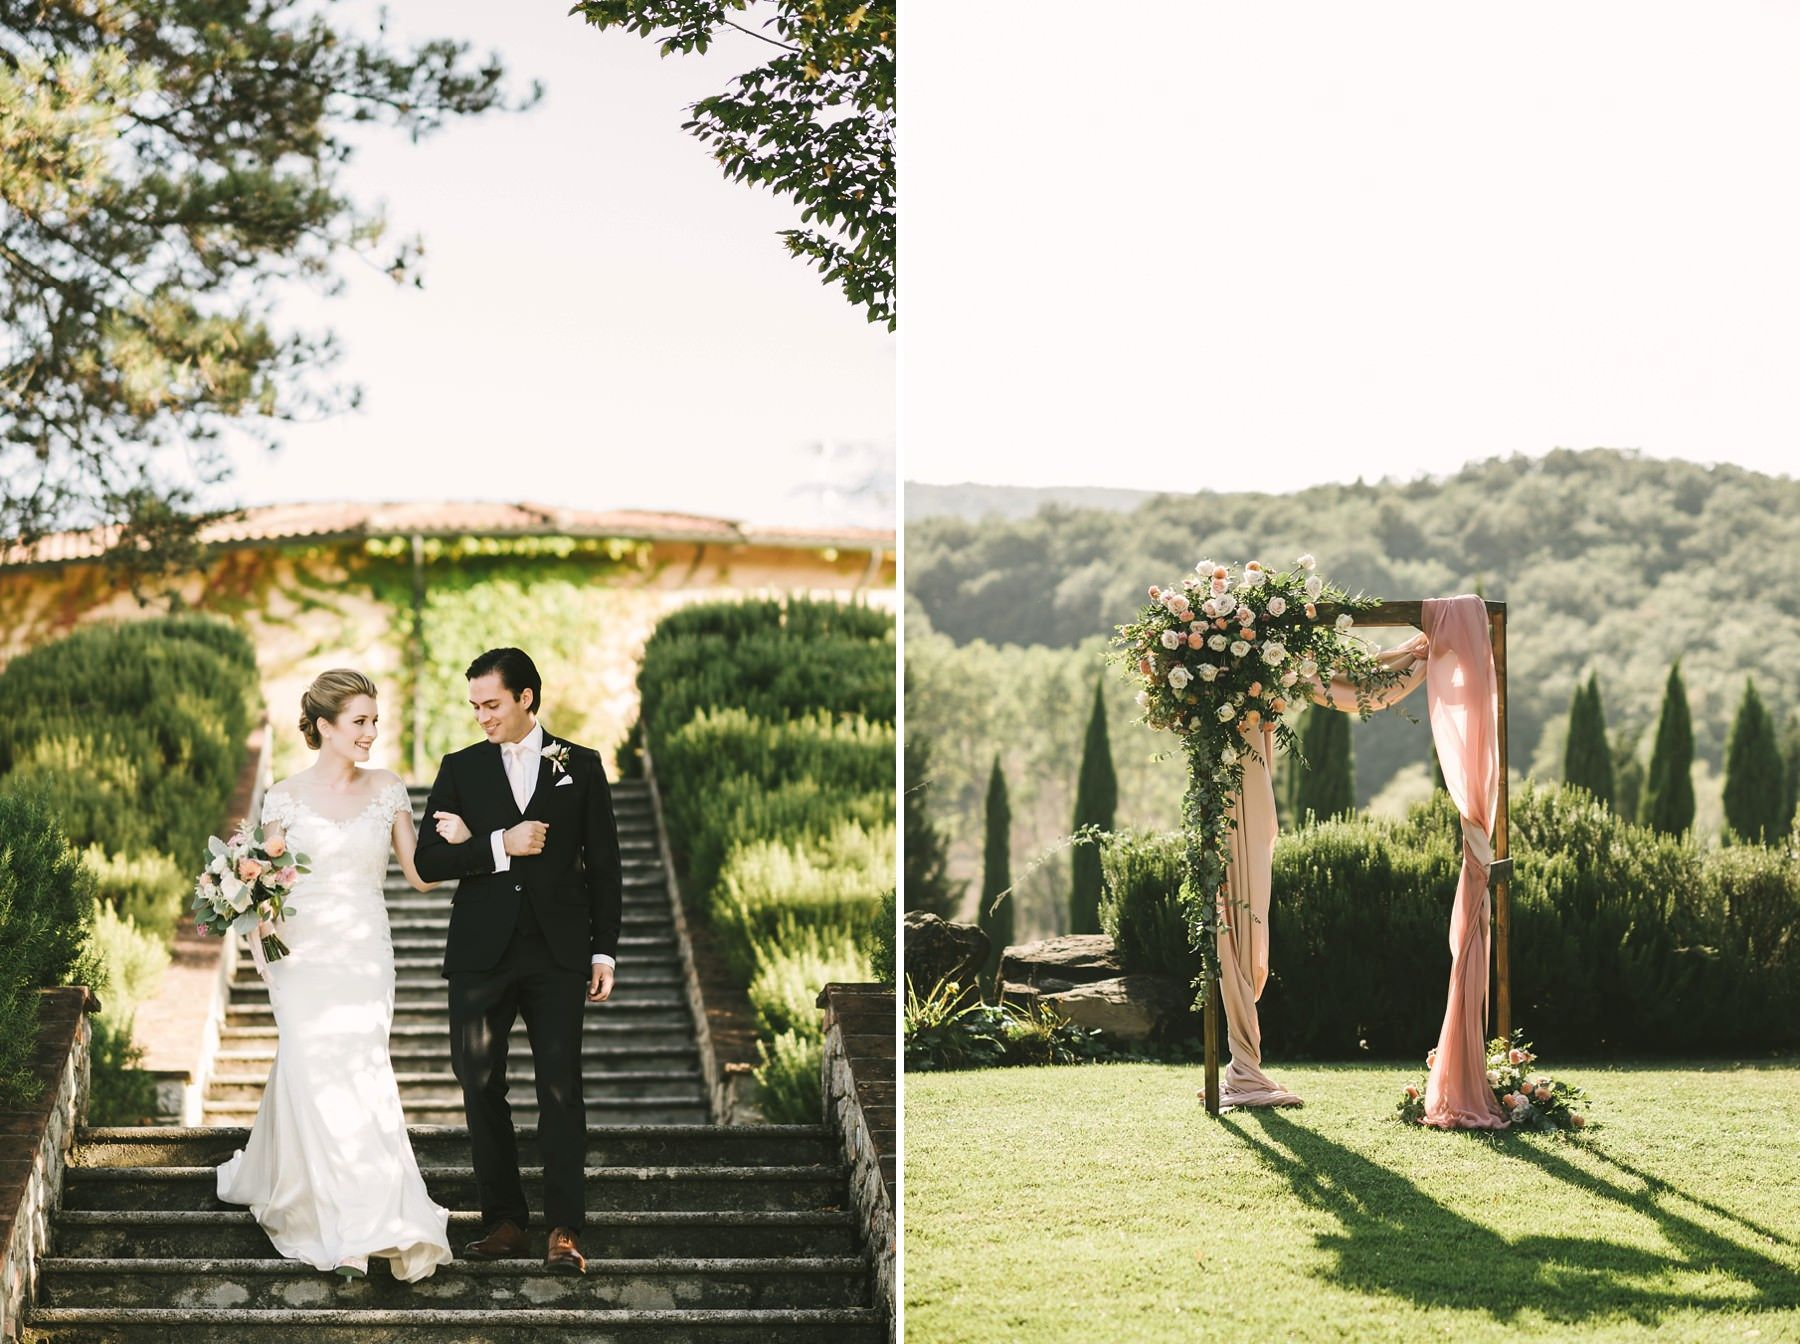 A Wonderful Elopement In Italy Wedding For Two At Villa La Selva Wine Resort Italy Wedding Elope Wedding Tuscany Wedding